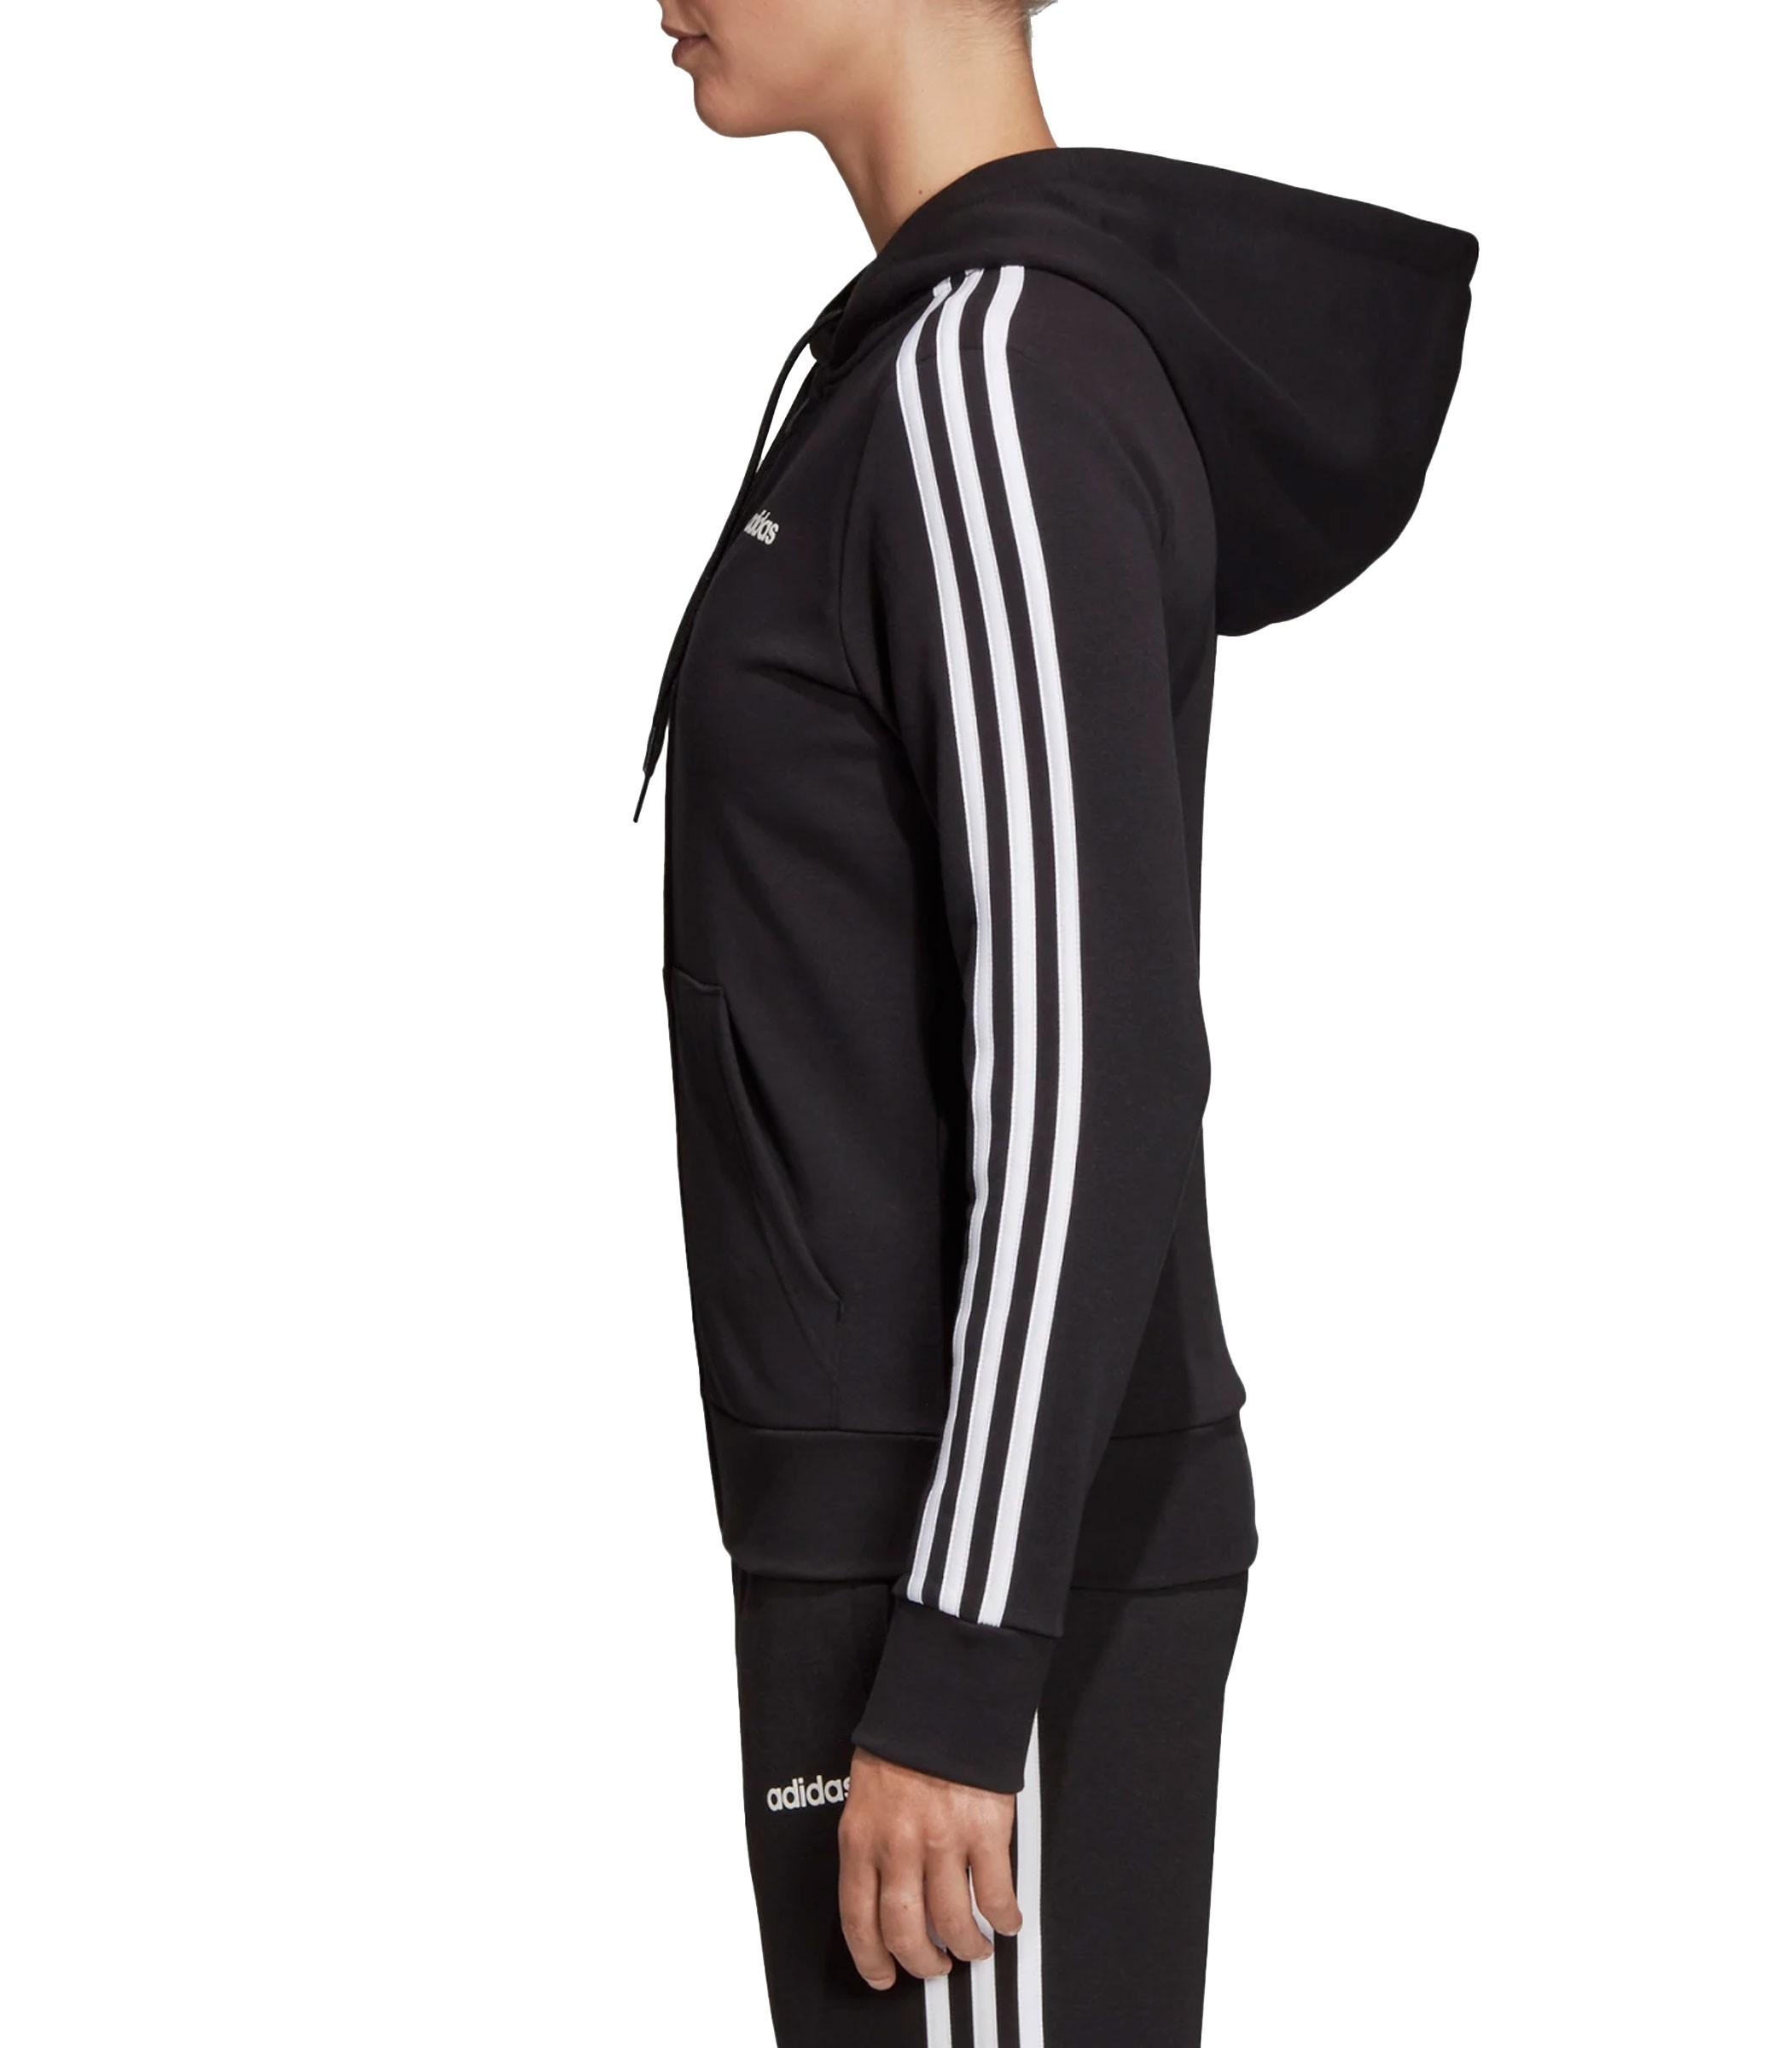 sports shoes 8c473 92ae3 Felpa con cappuccio Adidas Essentials 3-Stripes da donna rif ...